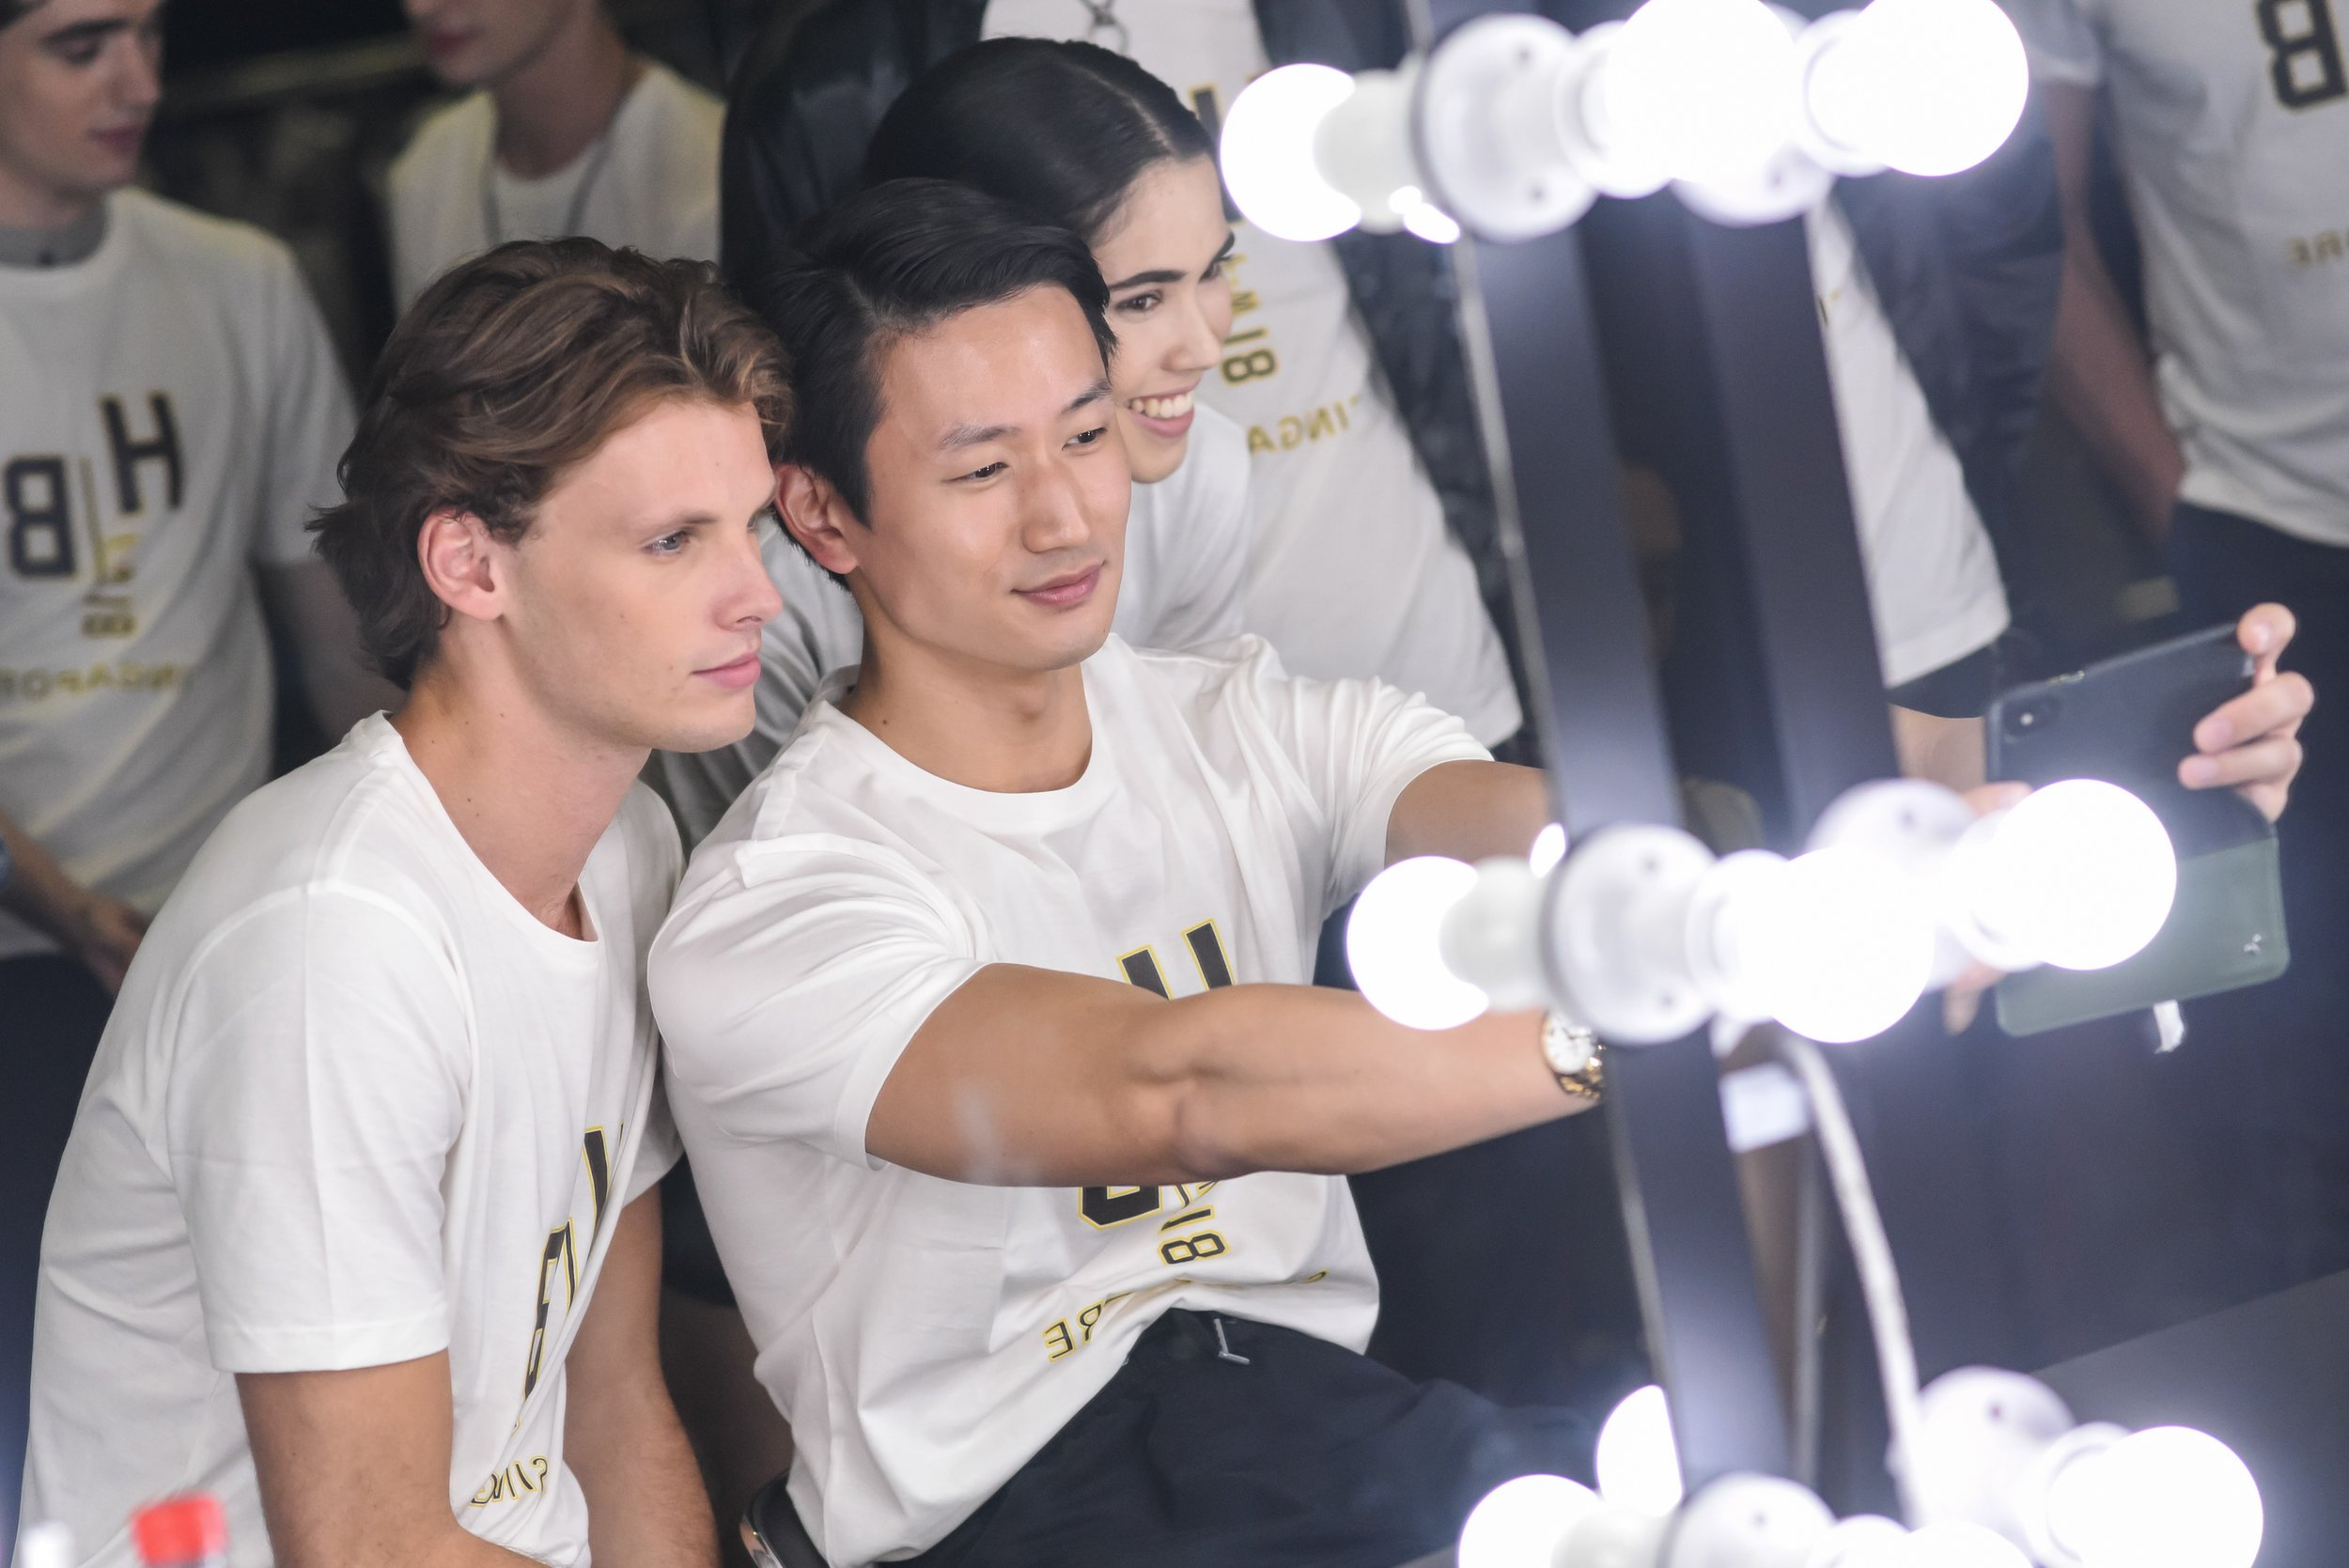 Models doing model things (Credit: Hugo Boss/@boss)